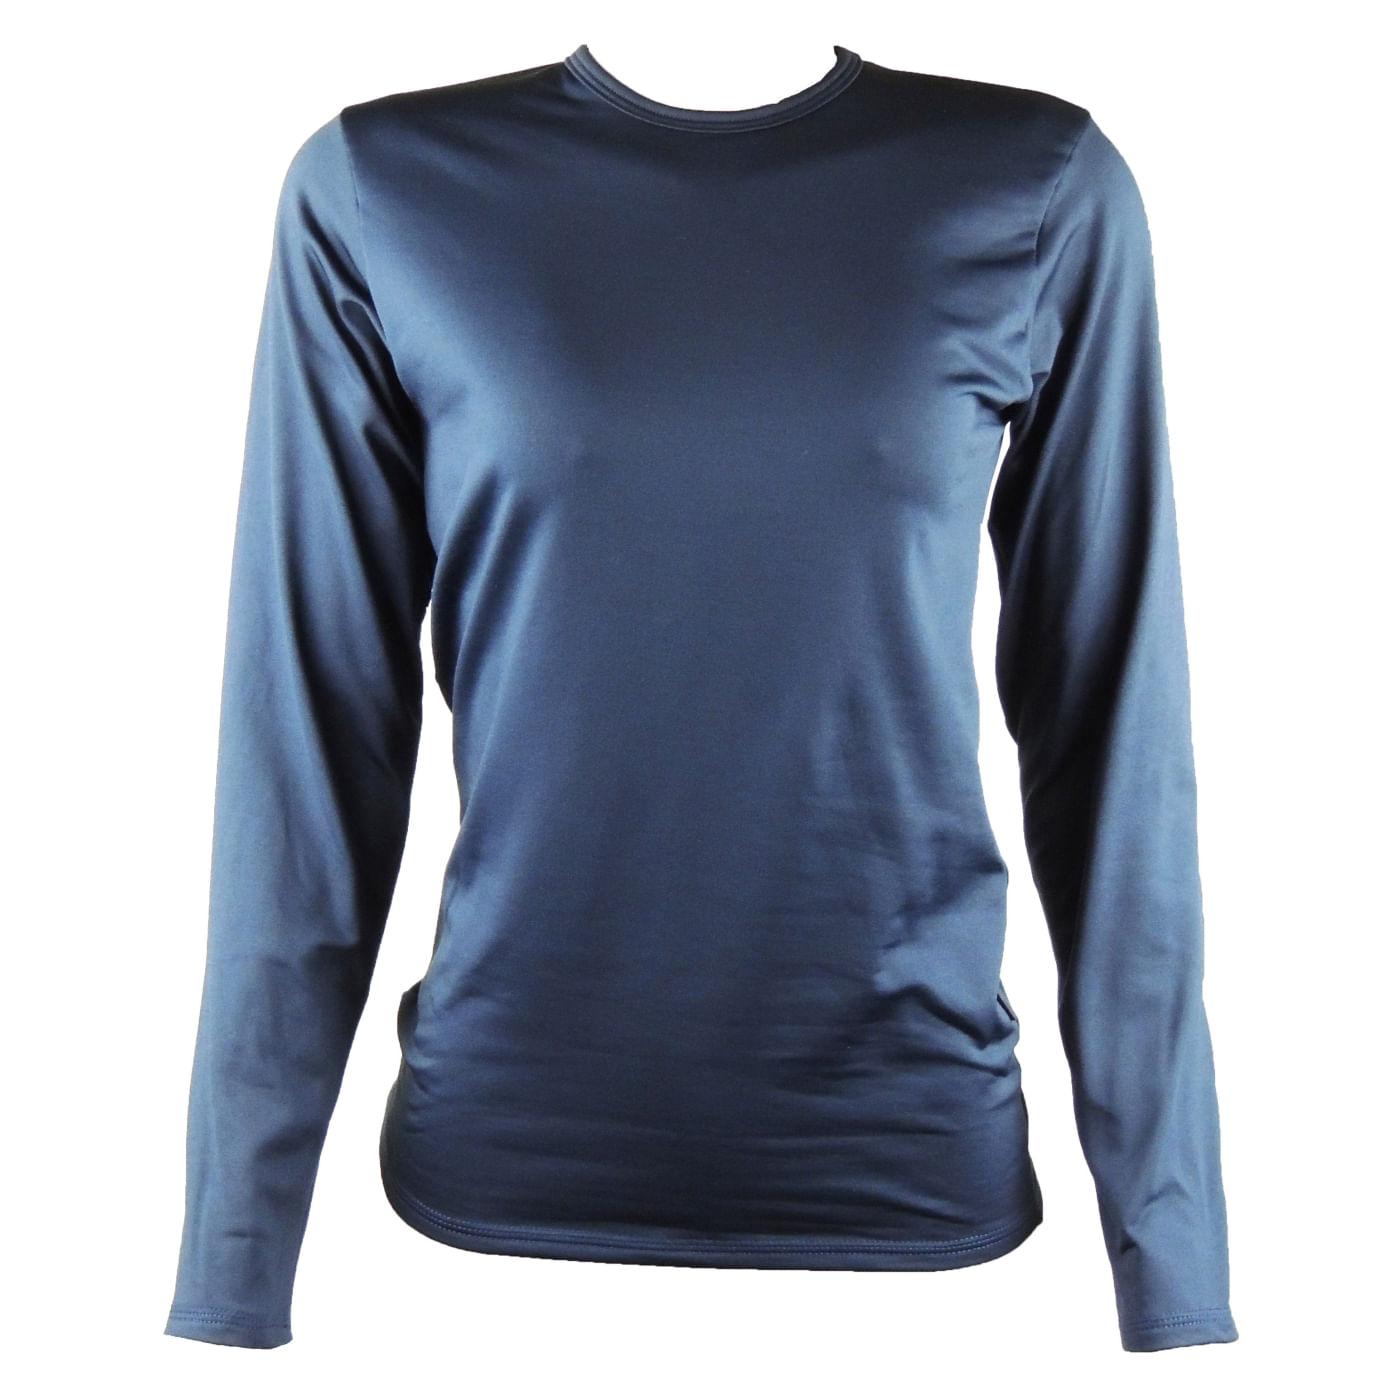 Blusa feminina azul marinho segunda pele térmica - fieroshop 2eef410979338